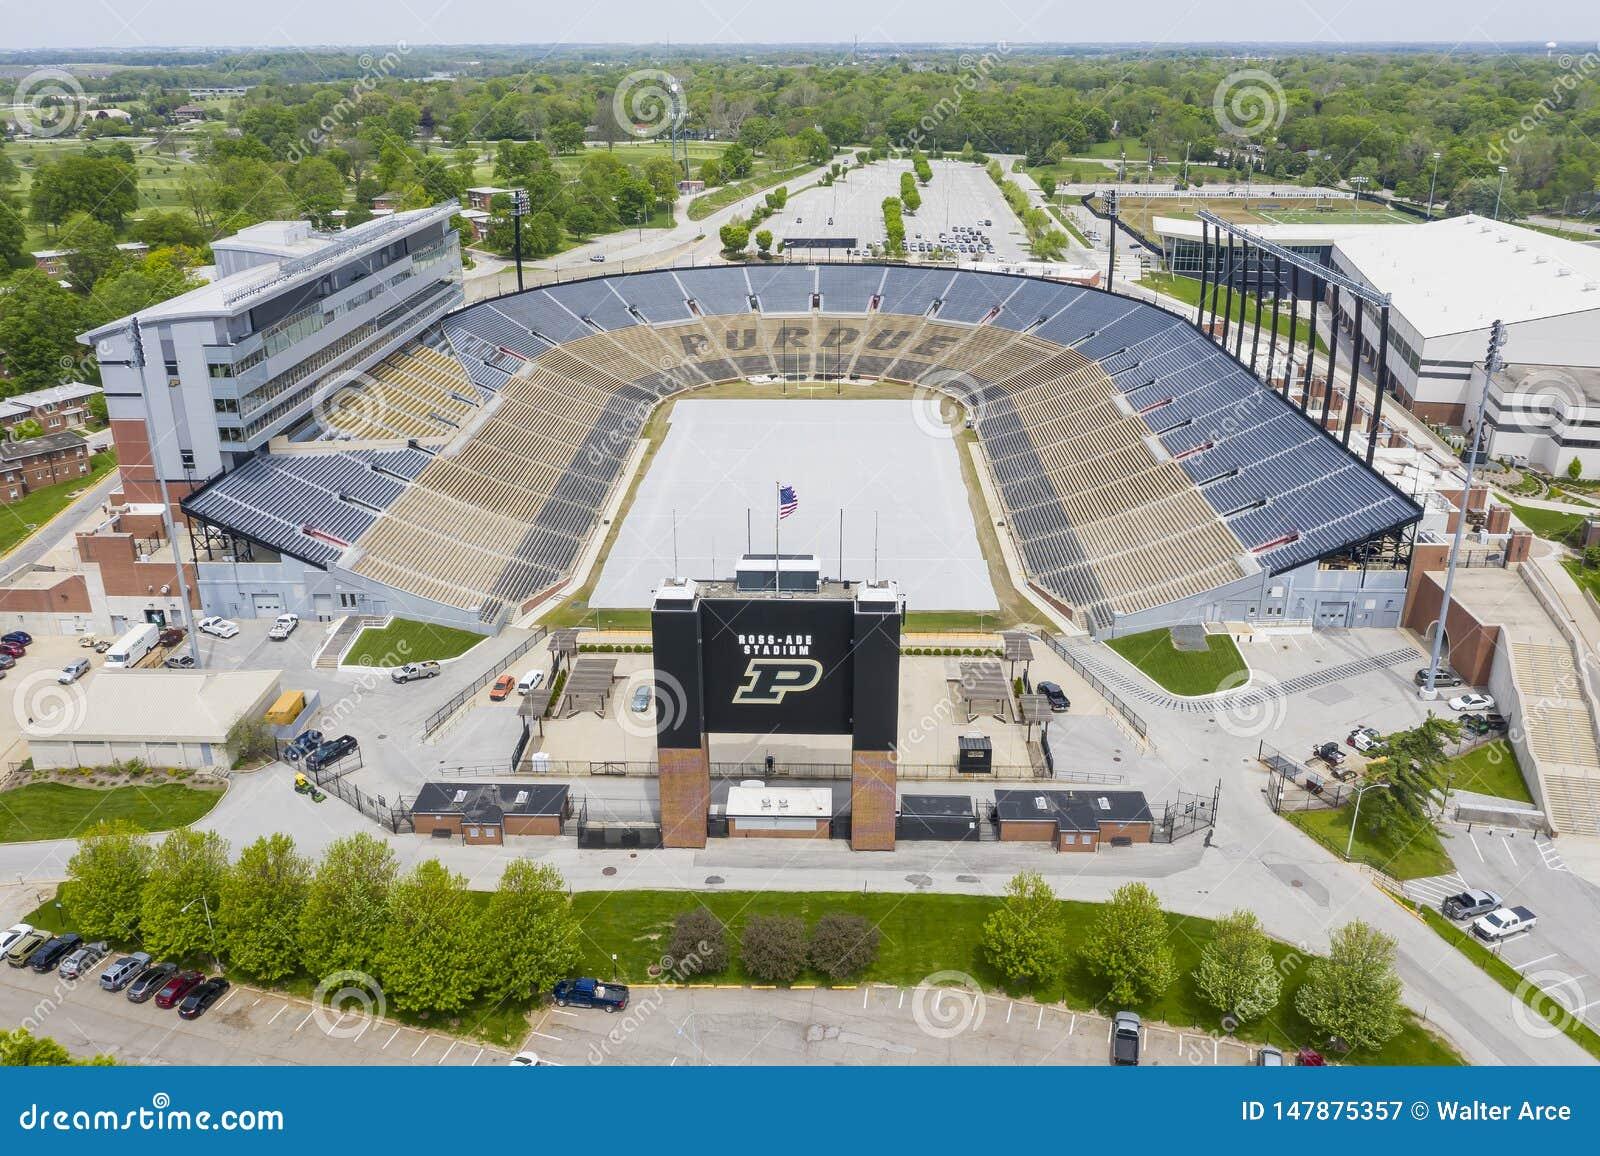 Satellietbeelden van Ross-Ade Stadium On The Campus van Purdue University